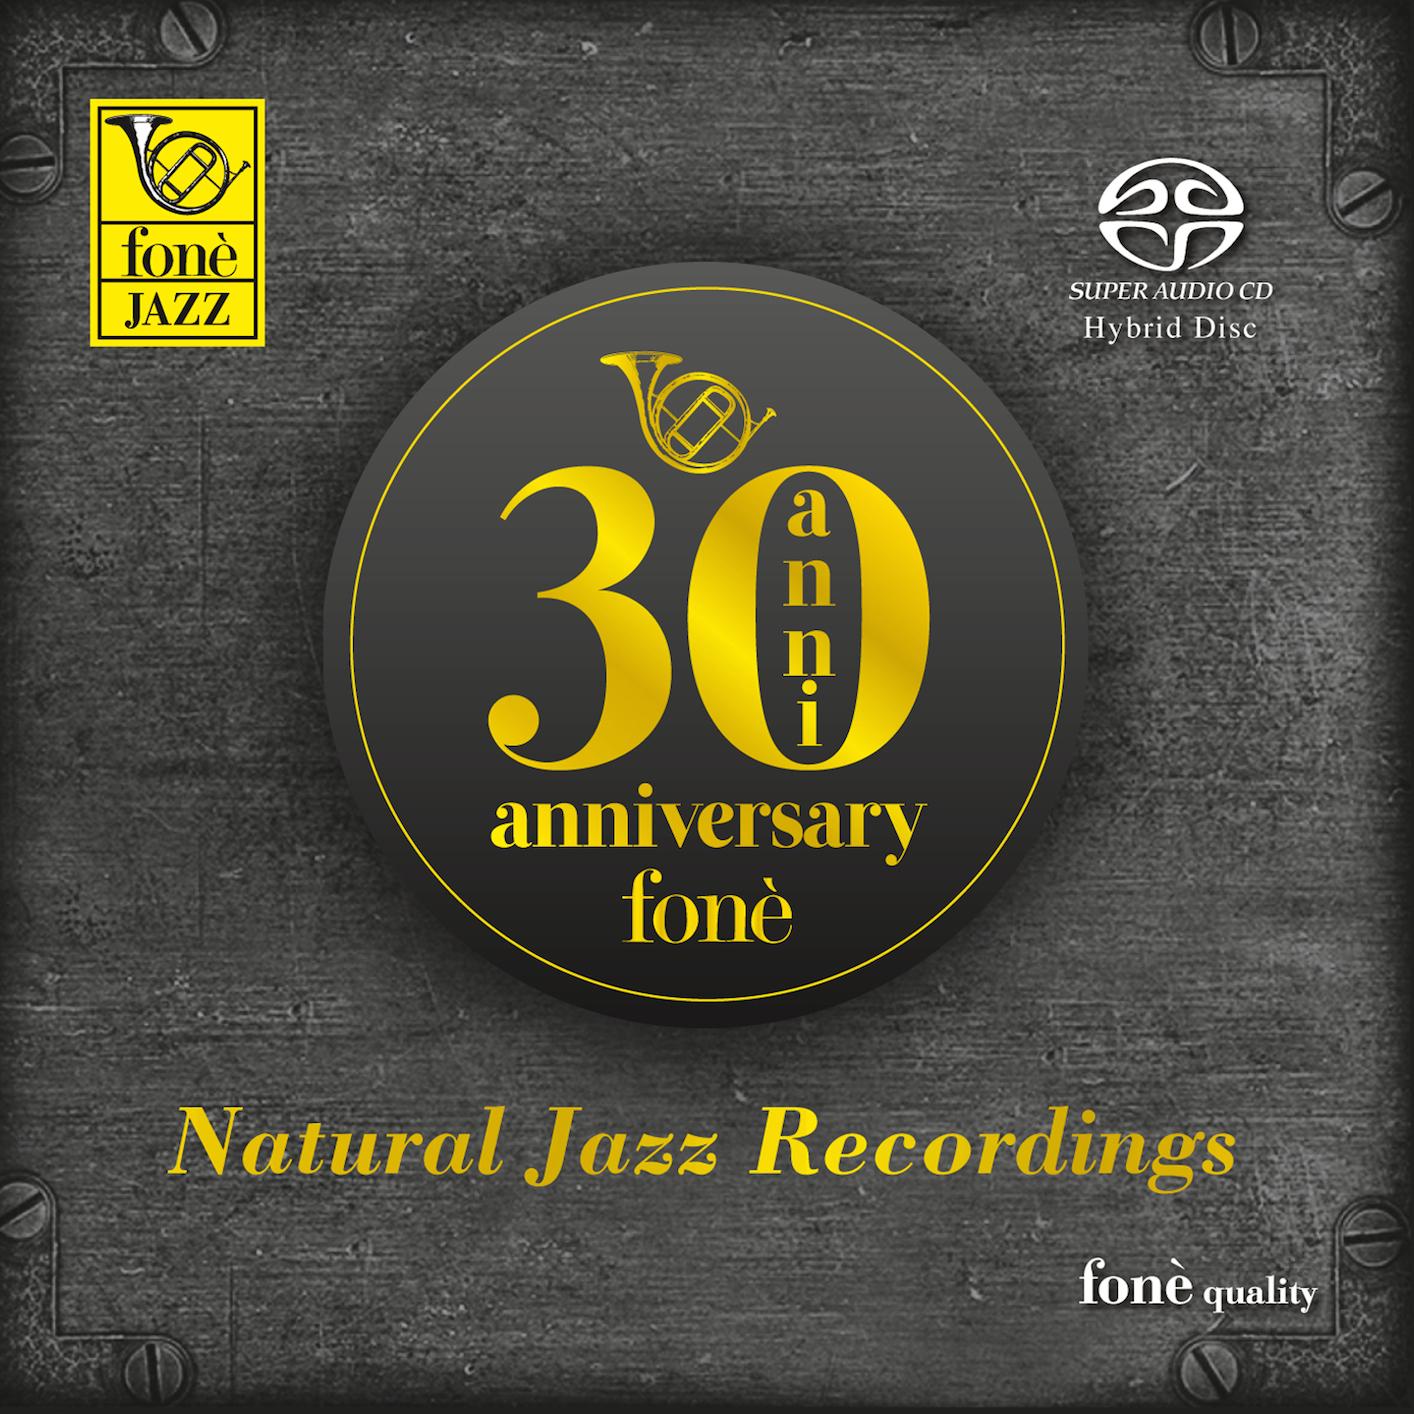 Cover fonè Natural Jazz Recordings (30th Anniversary)